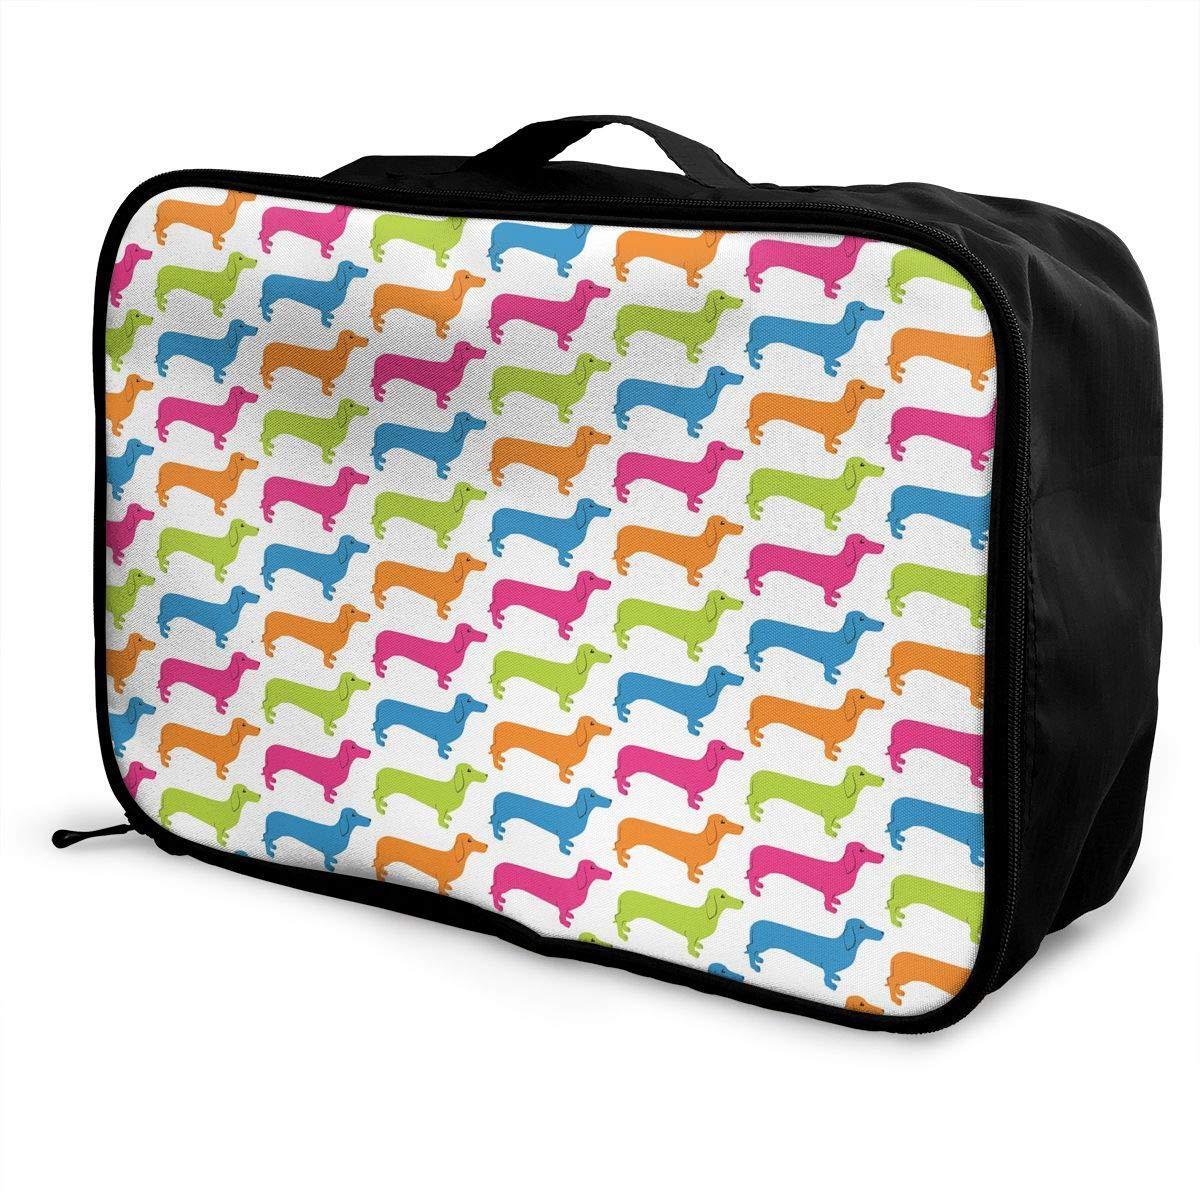 Travel Luggage Duffle Bag Lightweight Portable Handbag Colorful Dog Pattern Large Capacity Waterproof Foldable Storage Tote